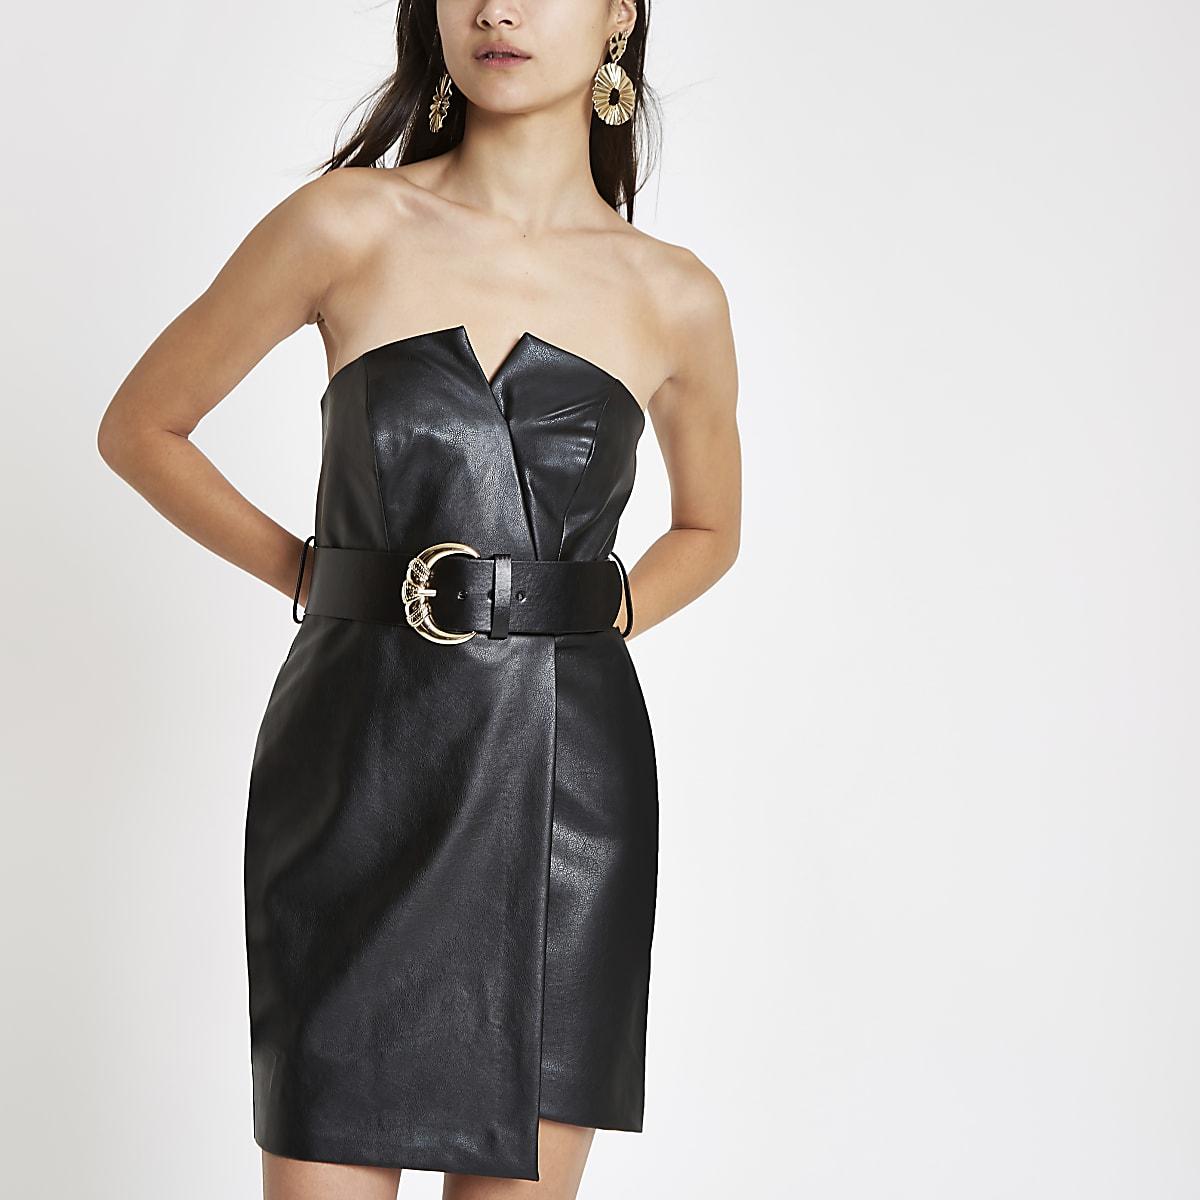 Schwarzes Bodycon-Minikleid mit Gürtel